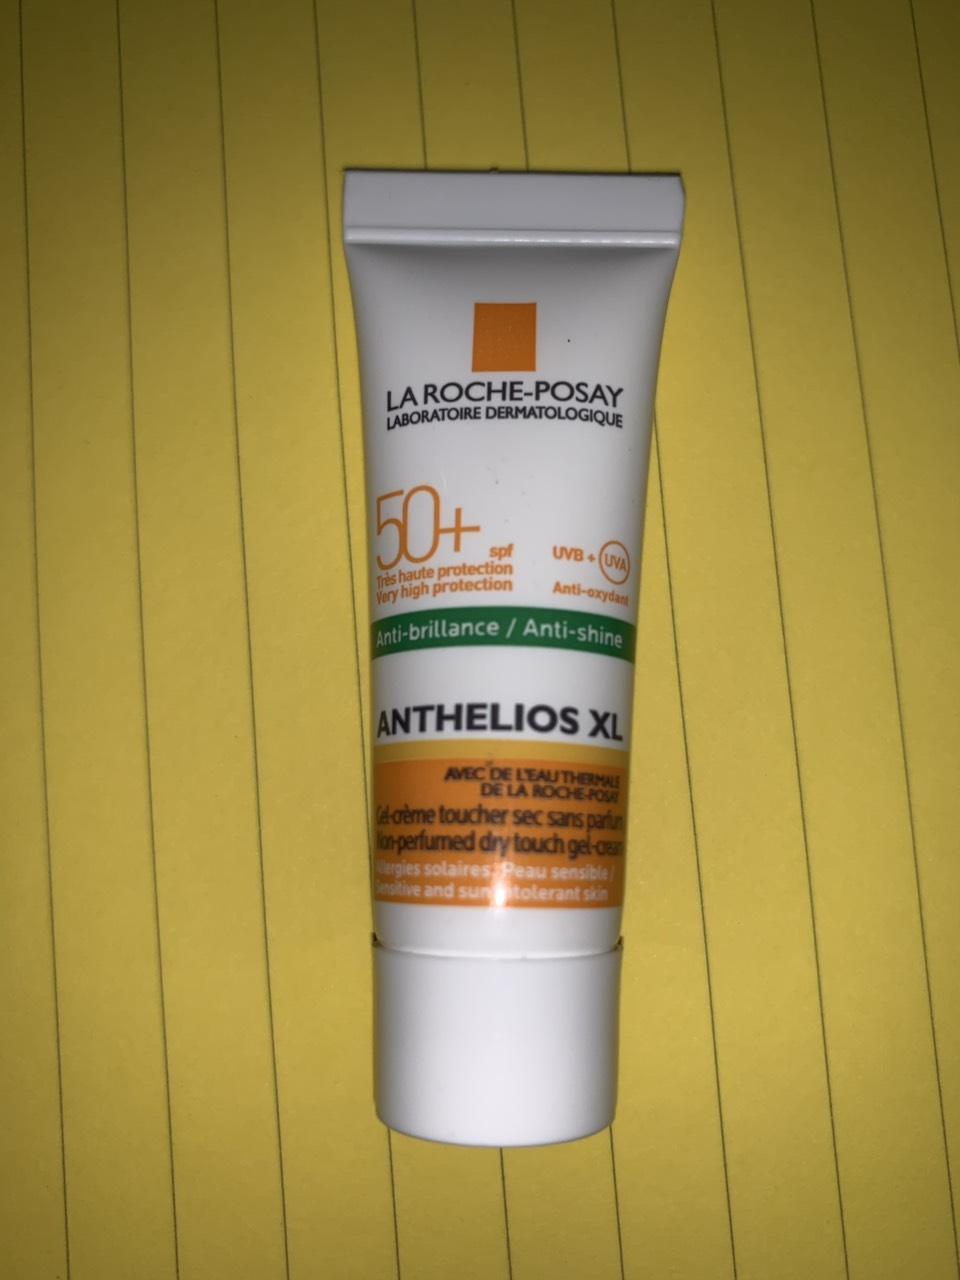 Kem Chống Nắng La Roche-Posay Anthelios XL DRY TOUCH SPF50+ Với Giá Sốc